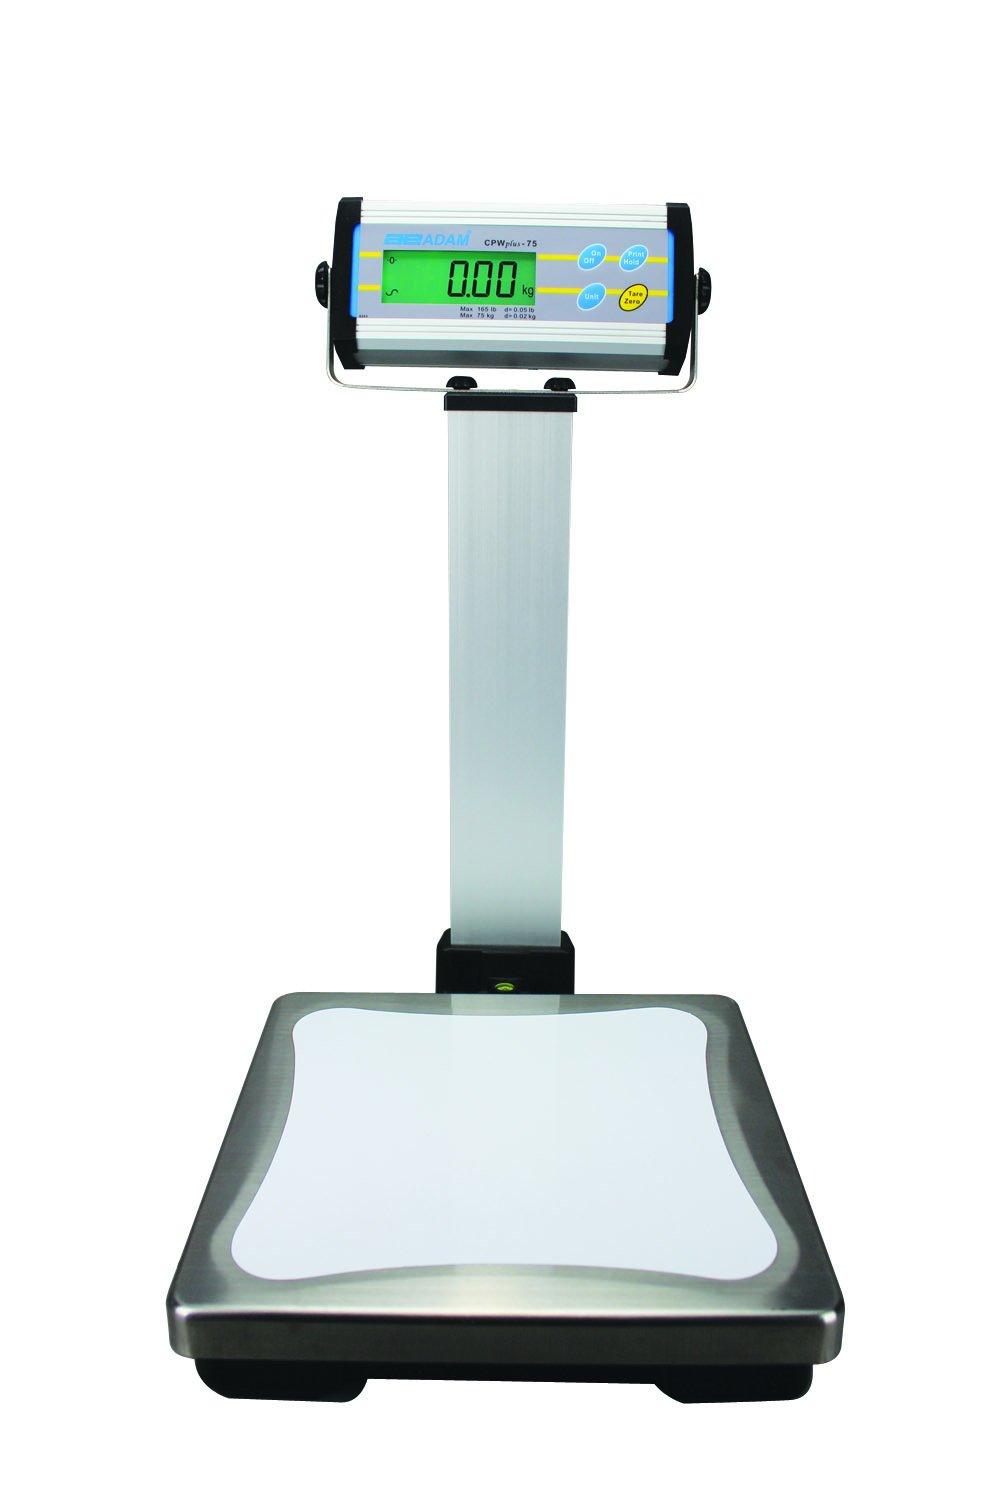 Image of Adam Equipment, CPWPLUS15, Bench Scale, Digital, 15kg/33 lb. Postal Scales